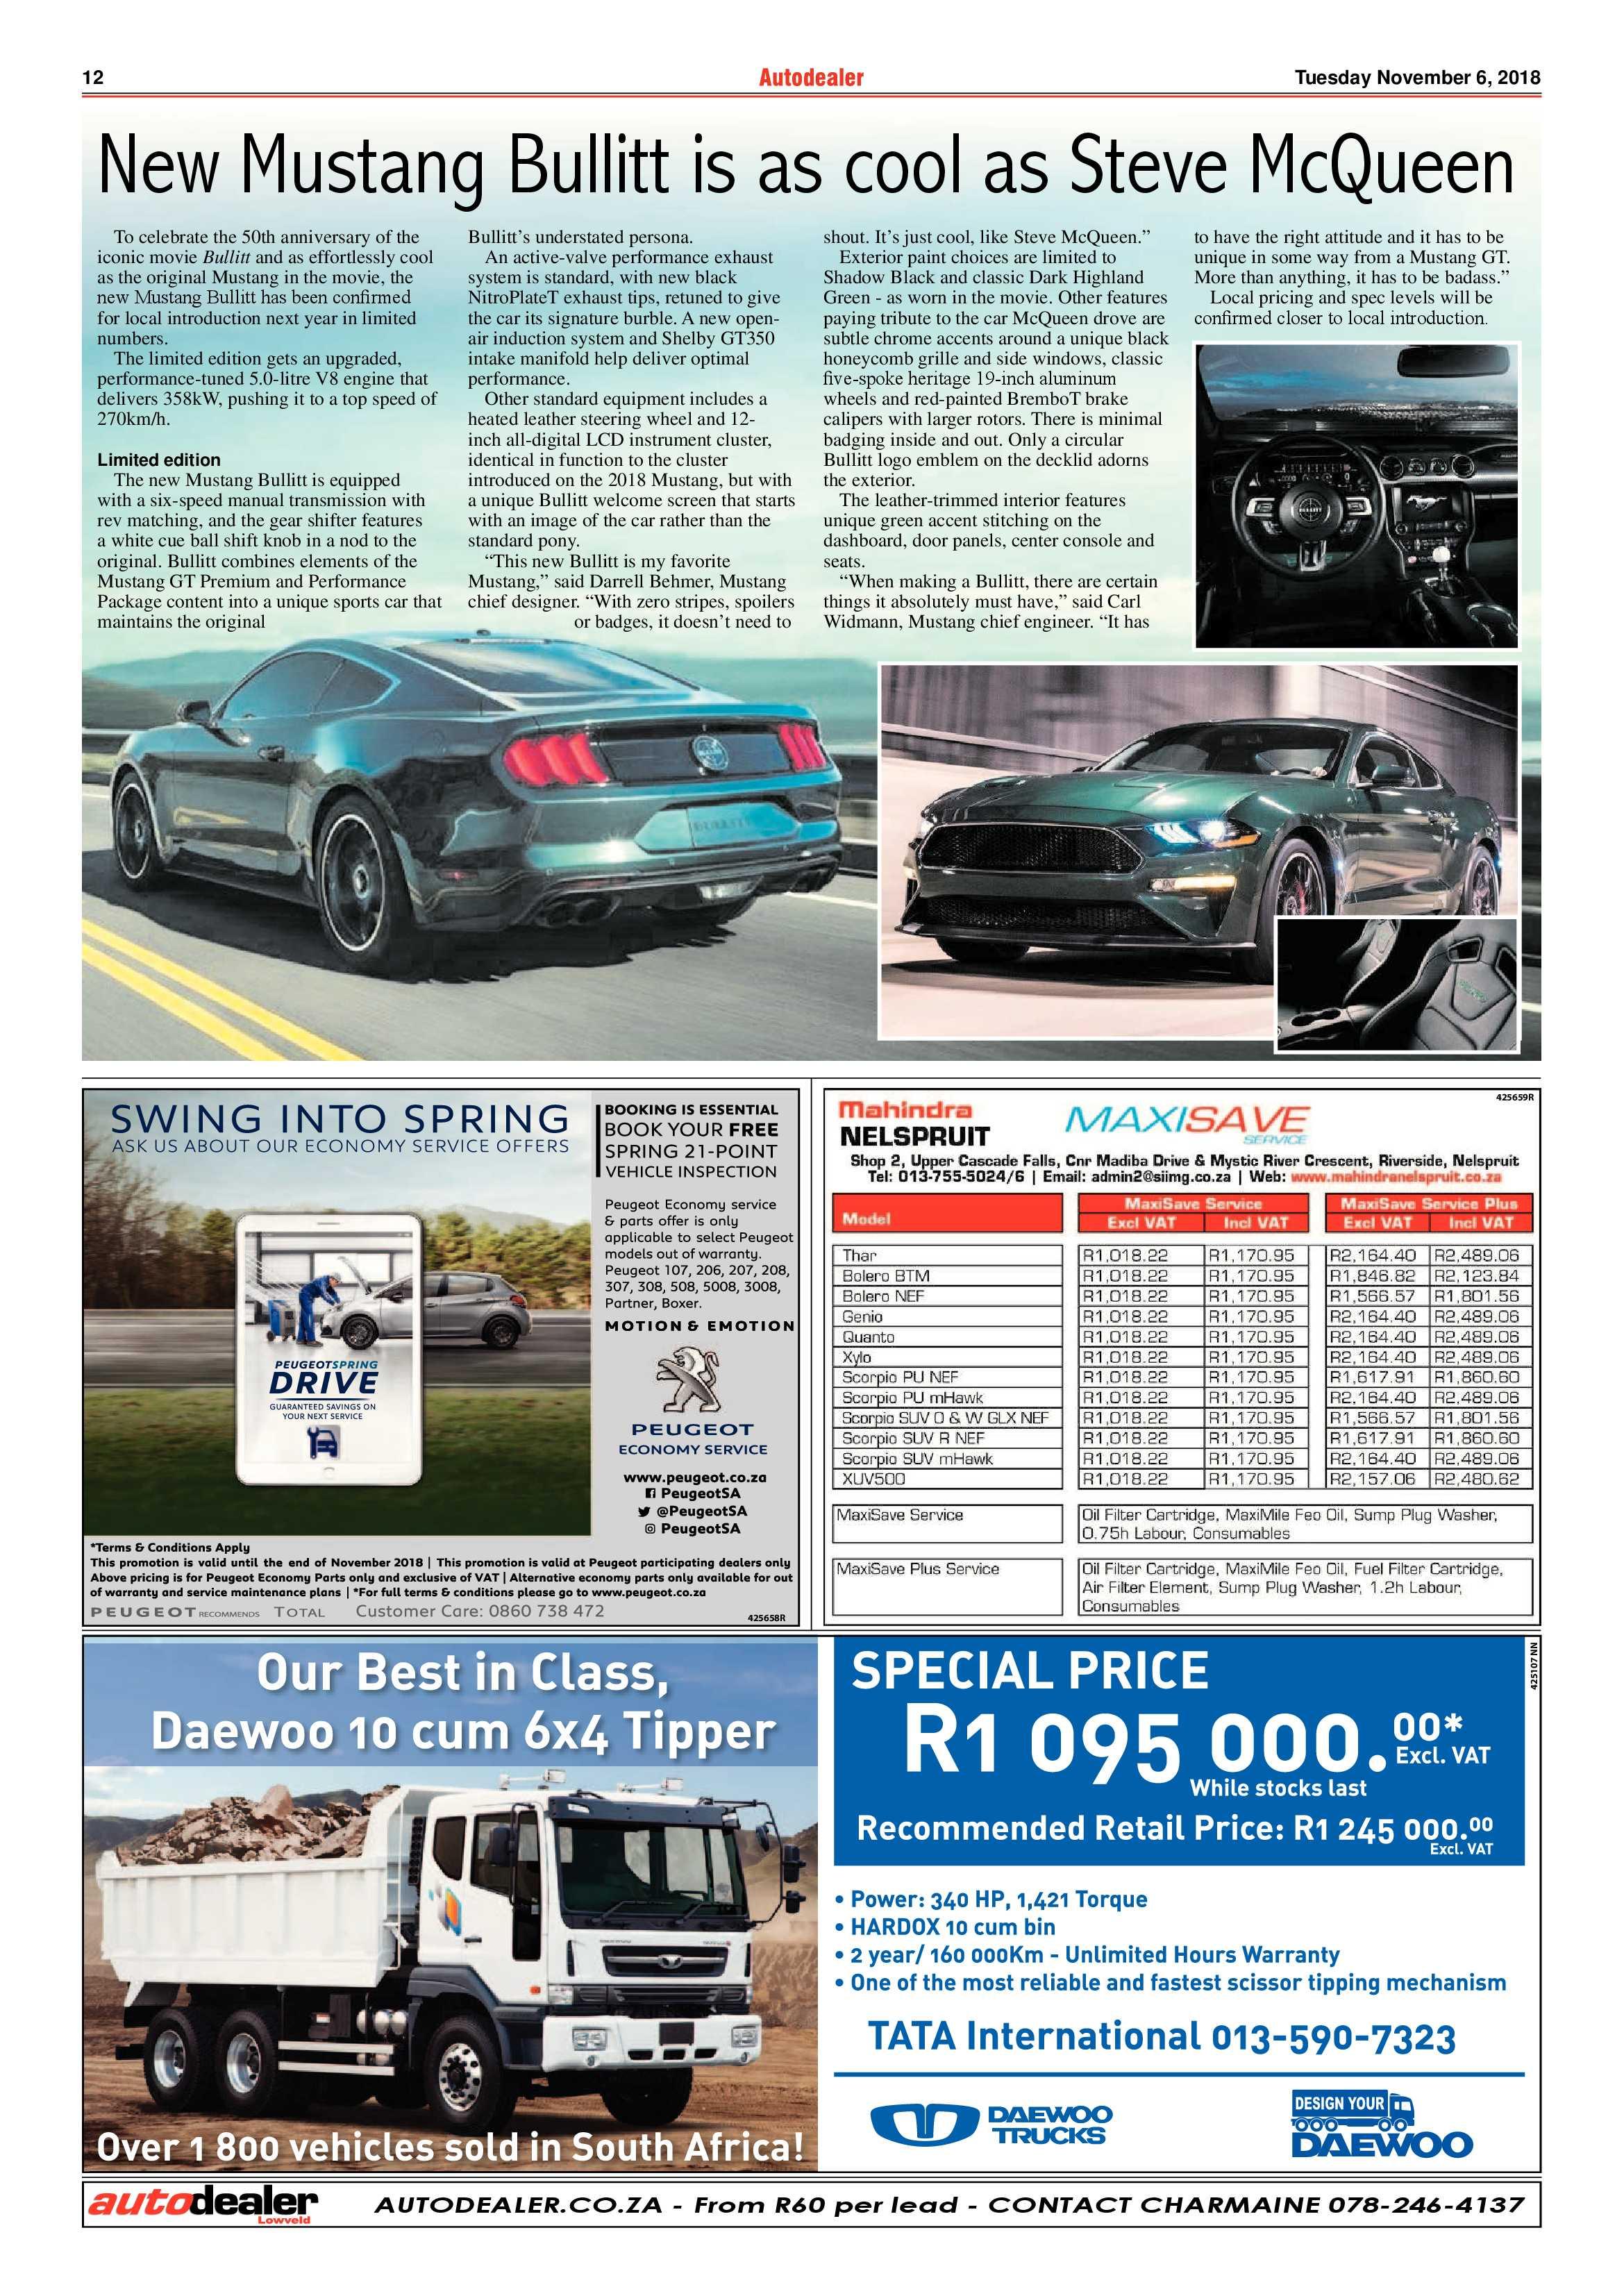 autodealer-6-november-2018-epapers-page-12